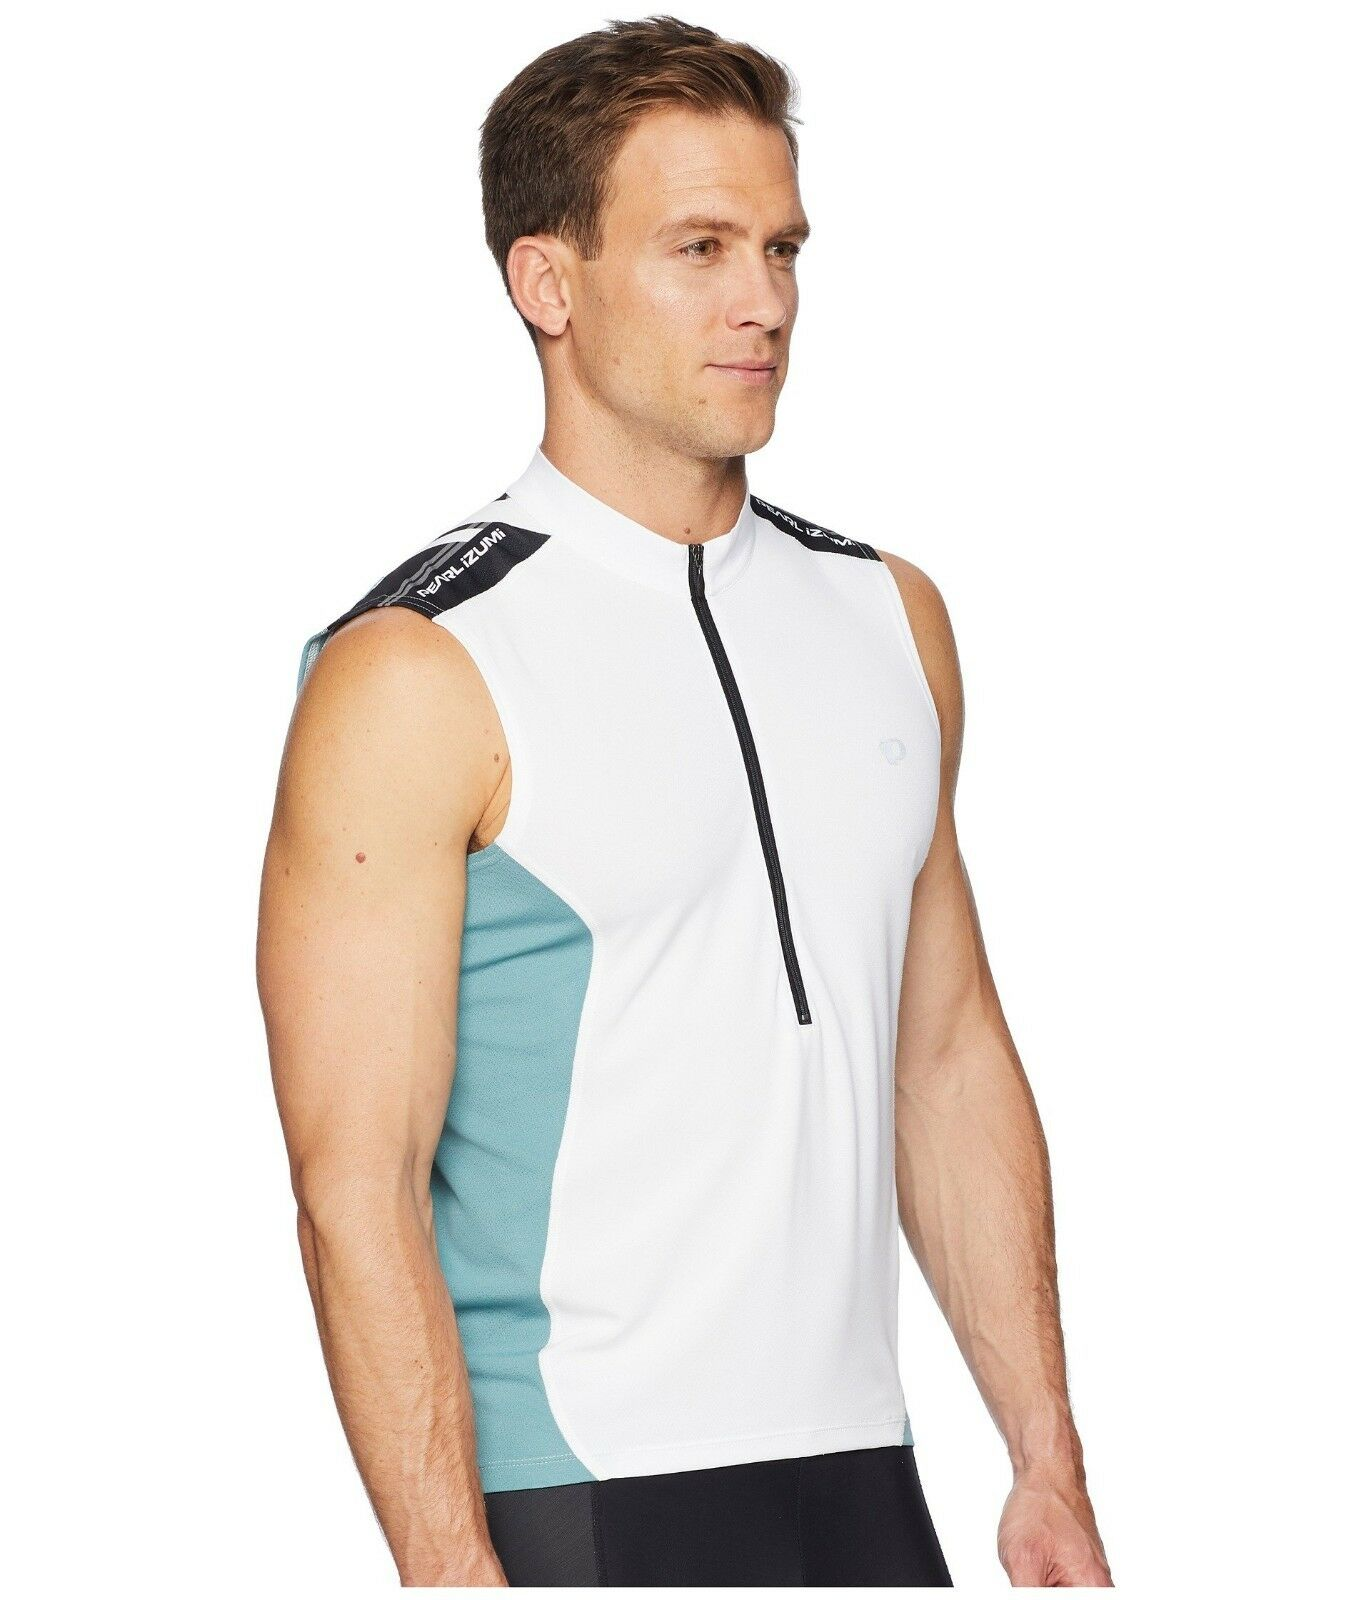 PEARL iZUMi Select Quest Men's Sleeveless Cycling Jersey HalfZipper bianca S NWT